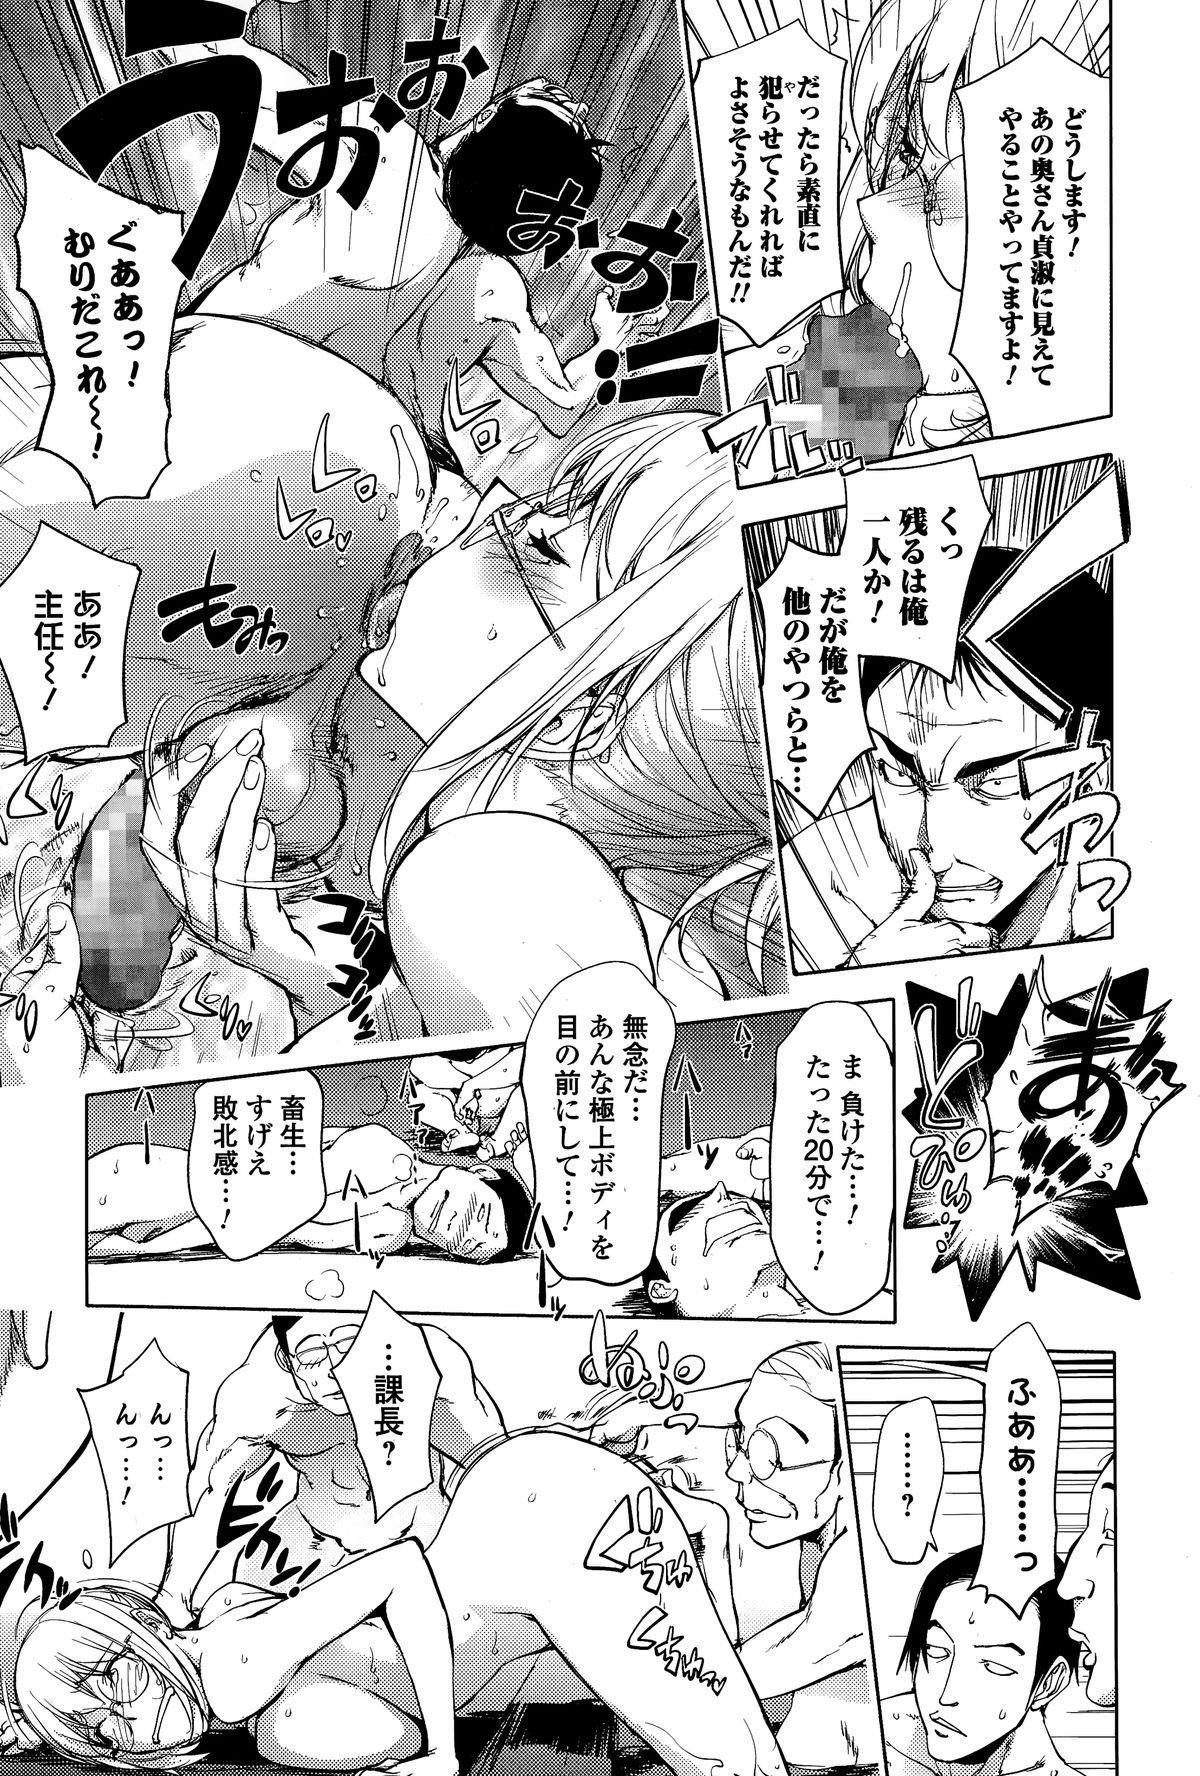 Comic Toutetsu 2015-02 Vol. 3 92